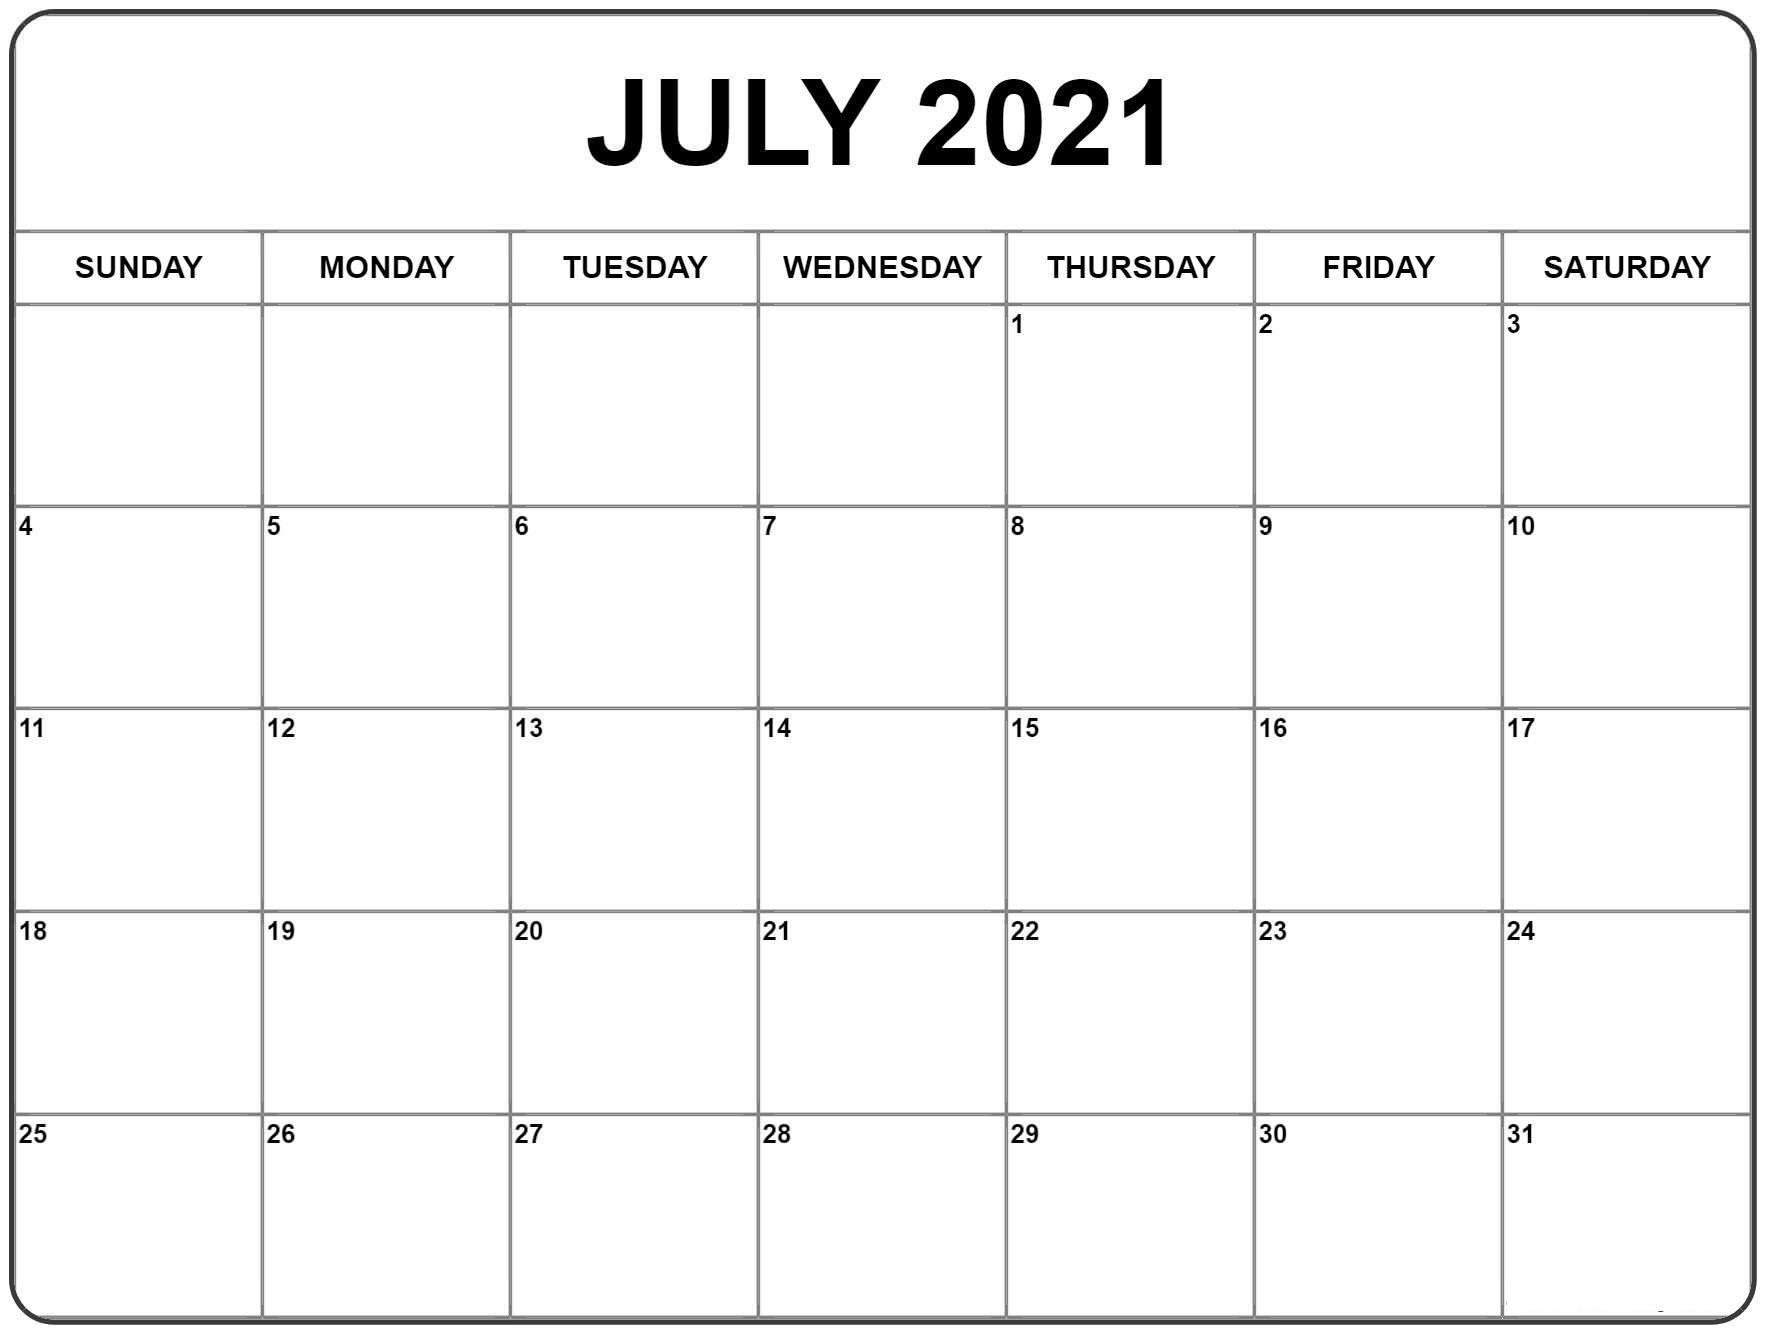 2021 July Blank Calendar